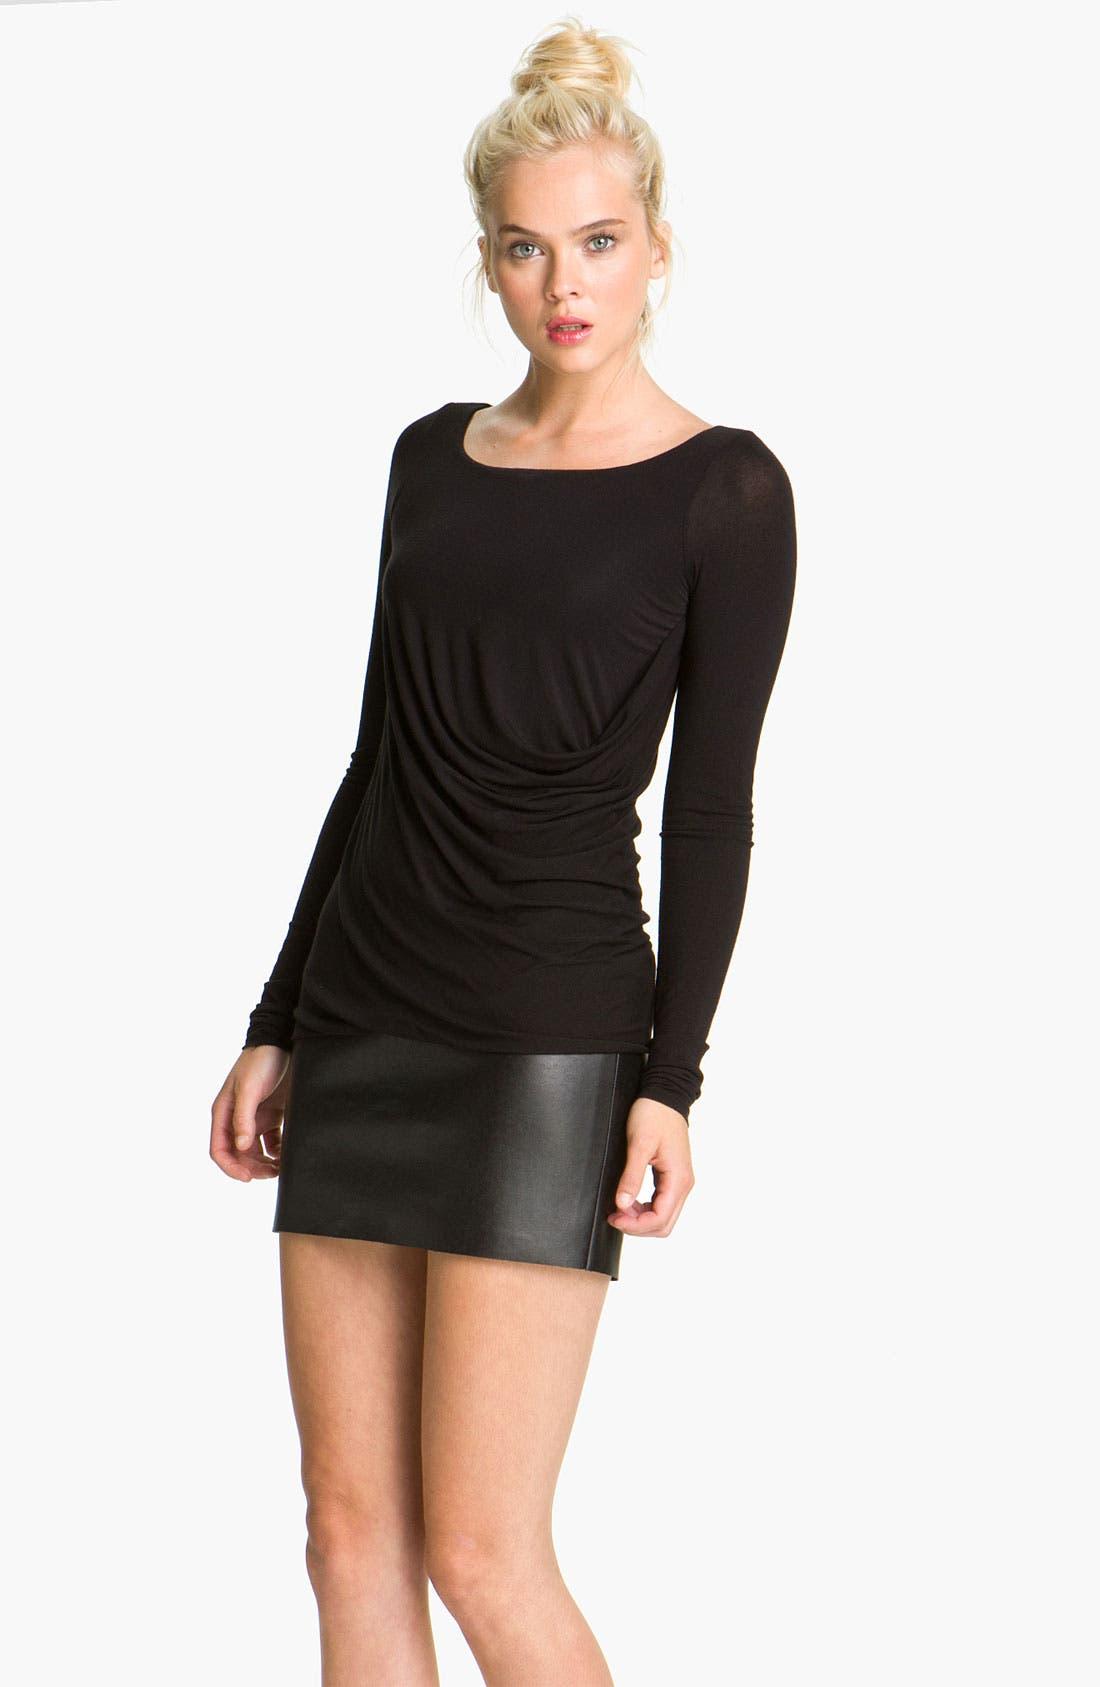 Main Image - Bailey 44 'Drop Out' Faux Leather Trim Dress